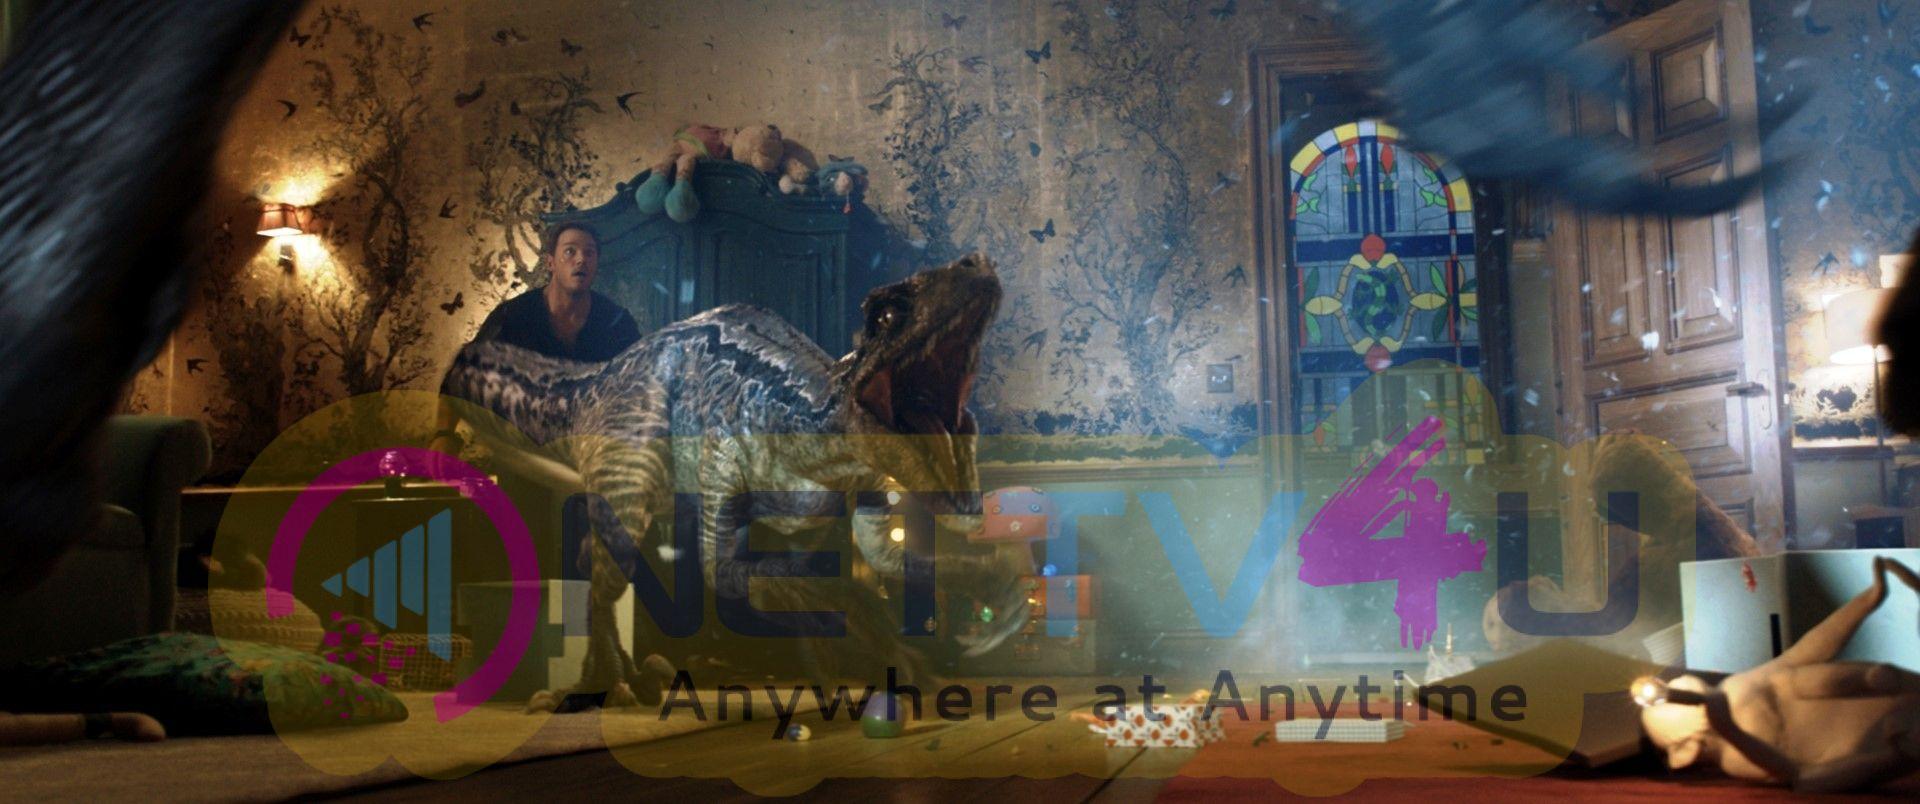 Jurassic World: Fallen Kingdom Movie Stills